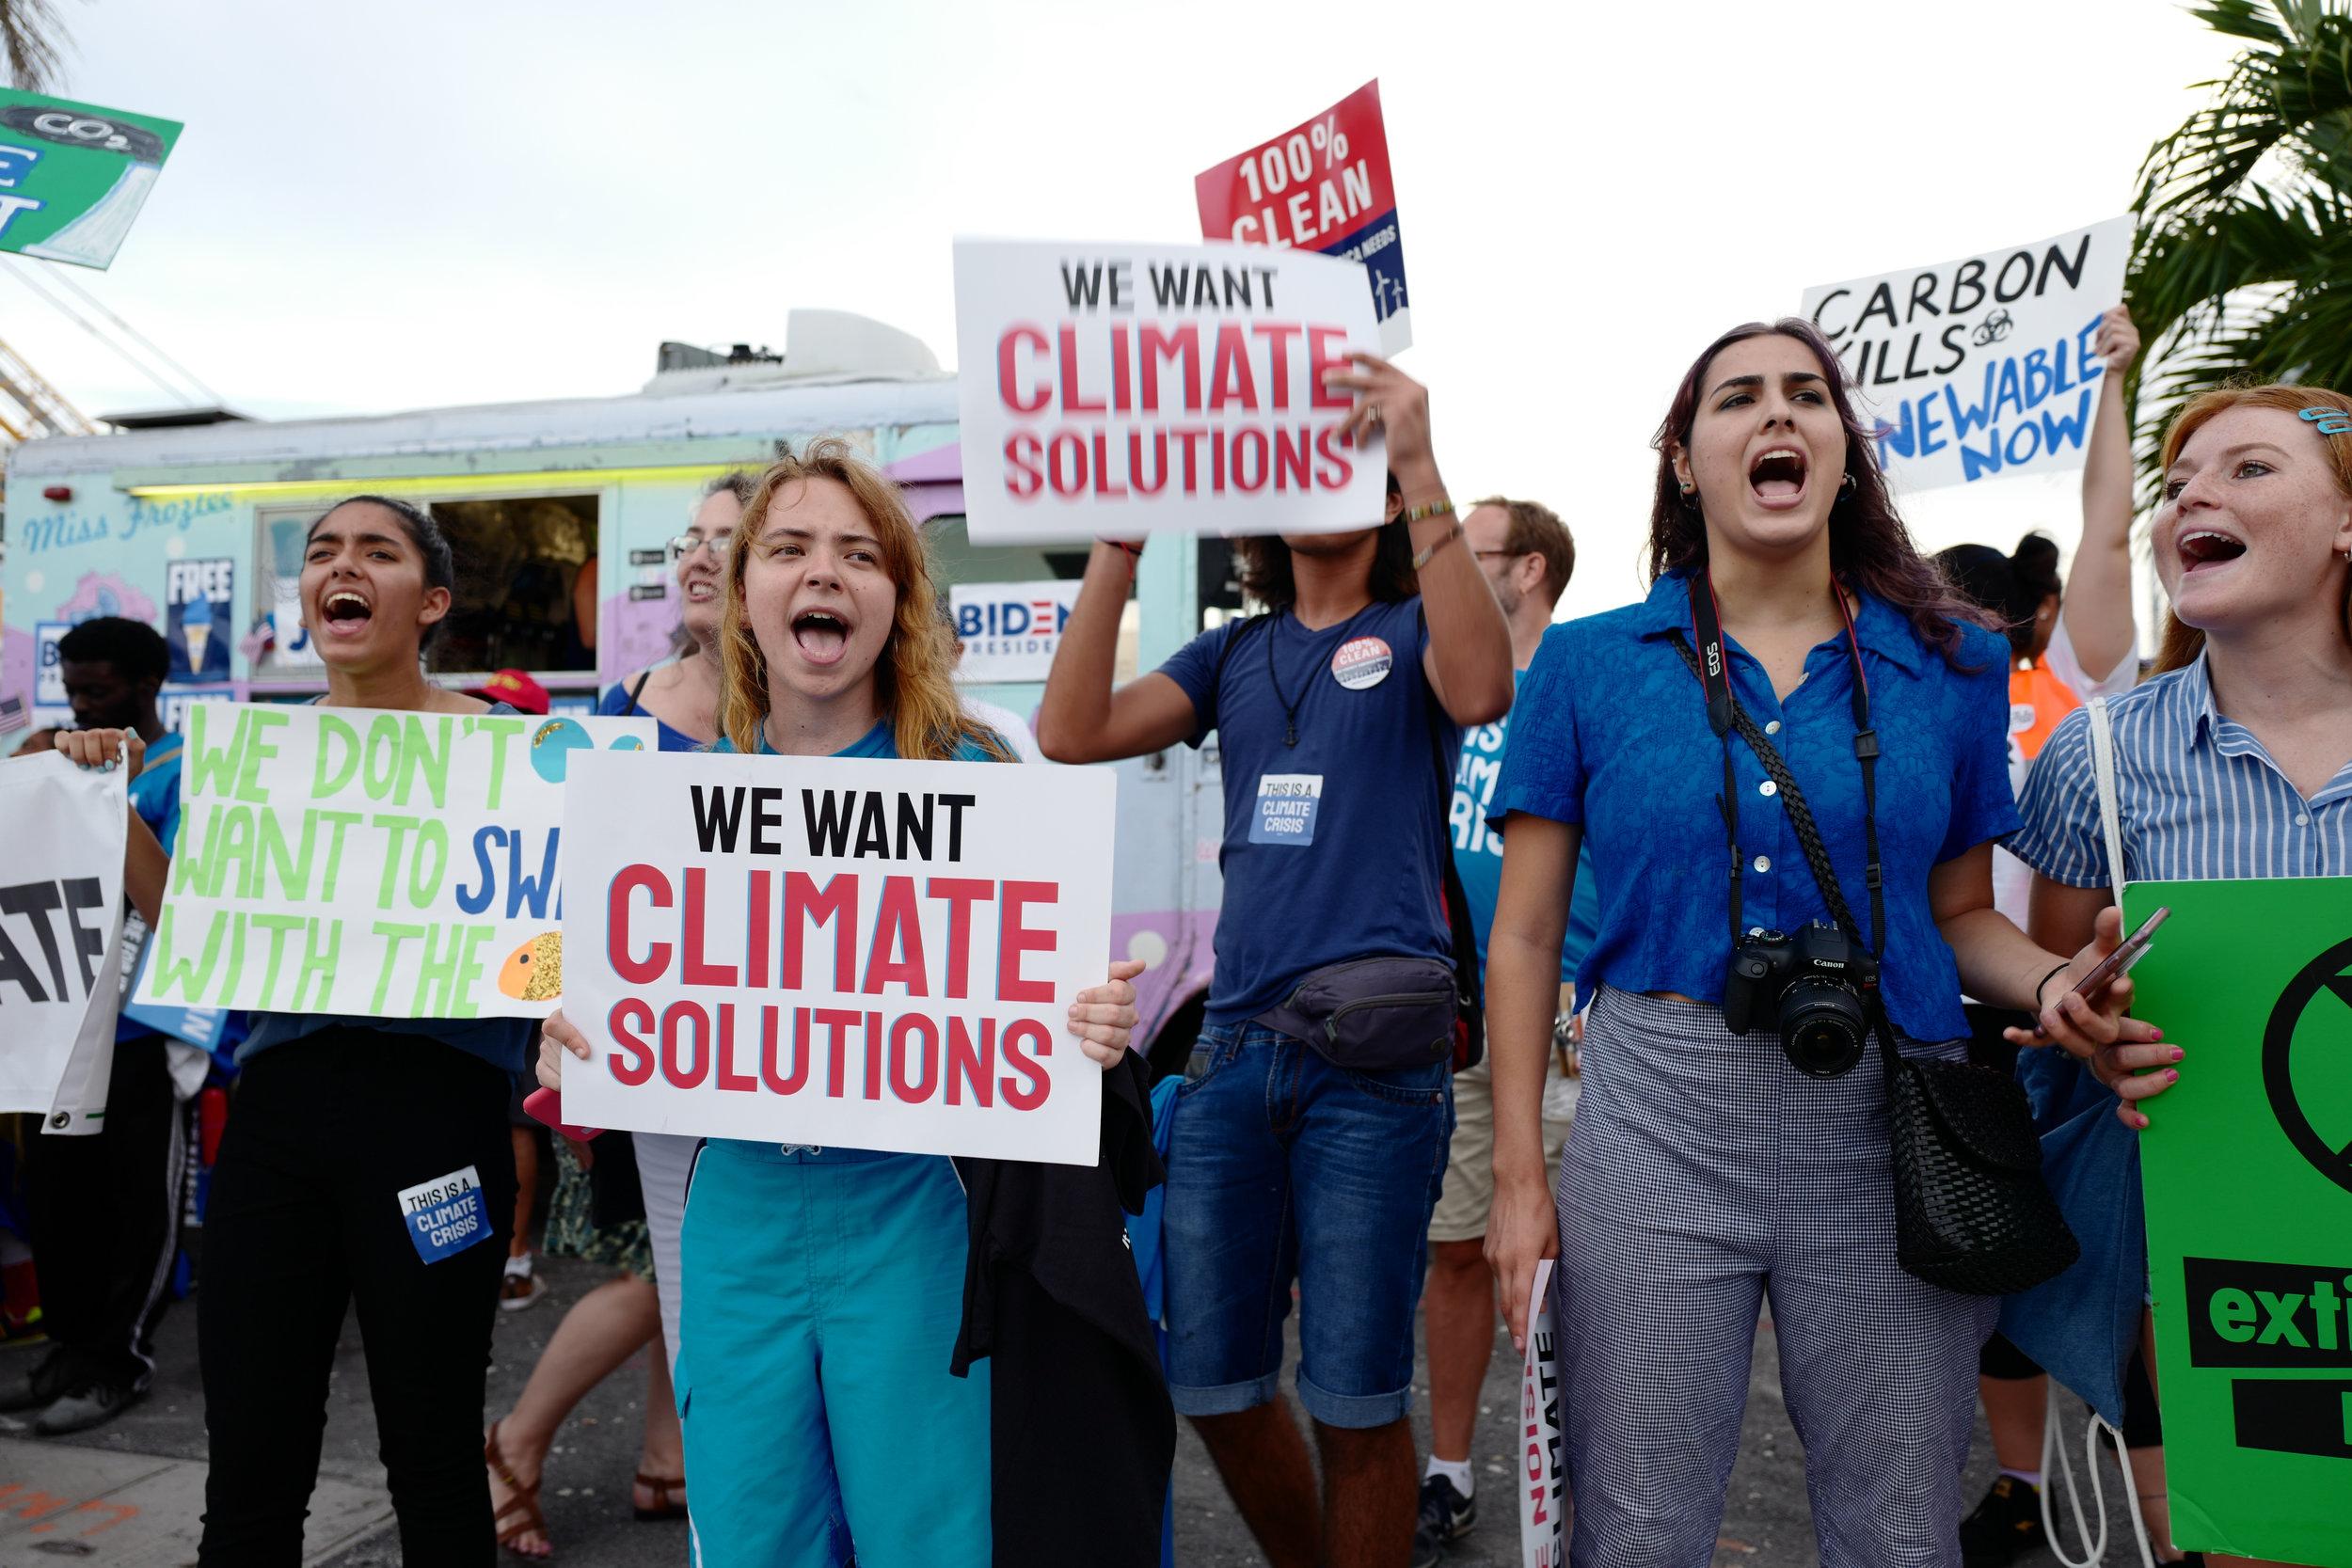 Climate demonstration, Miami, June 2019. Credit: Shutterstock.com